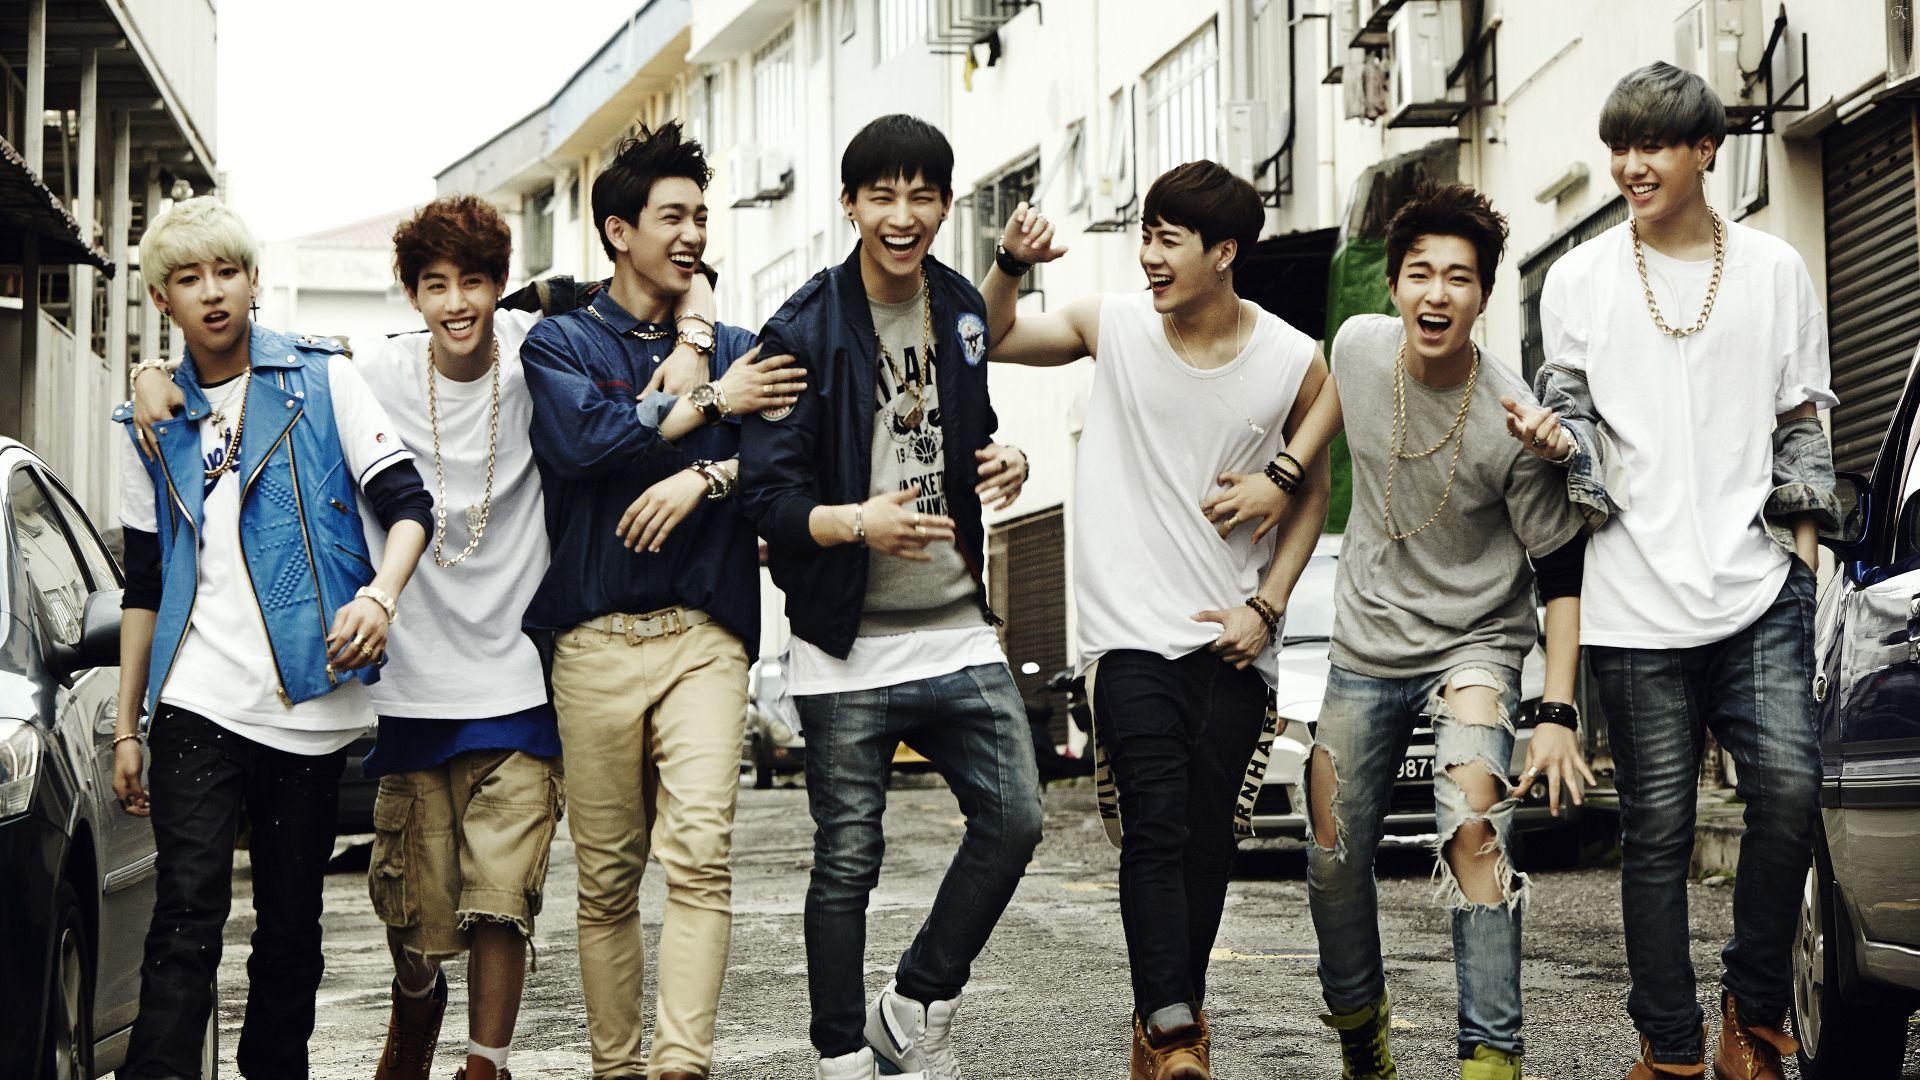 Desktop Wallpaper Got7 Jackson Wallpaper Kpop Boys